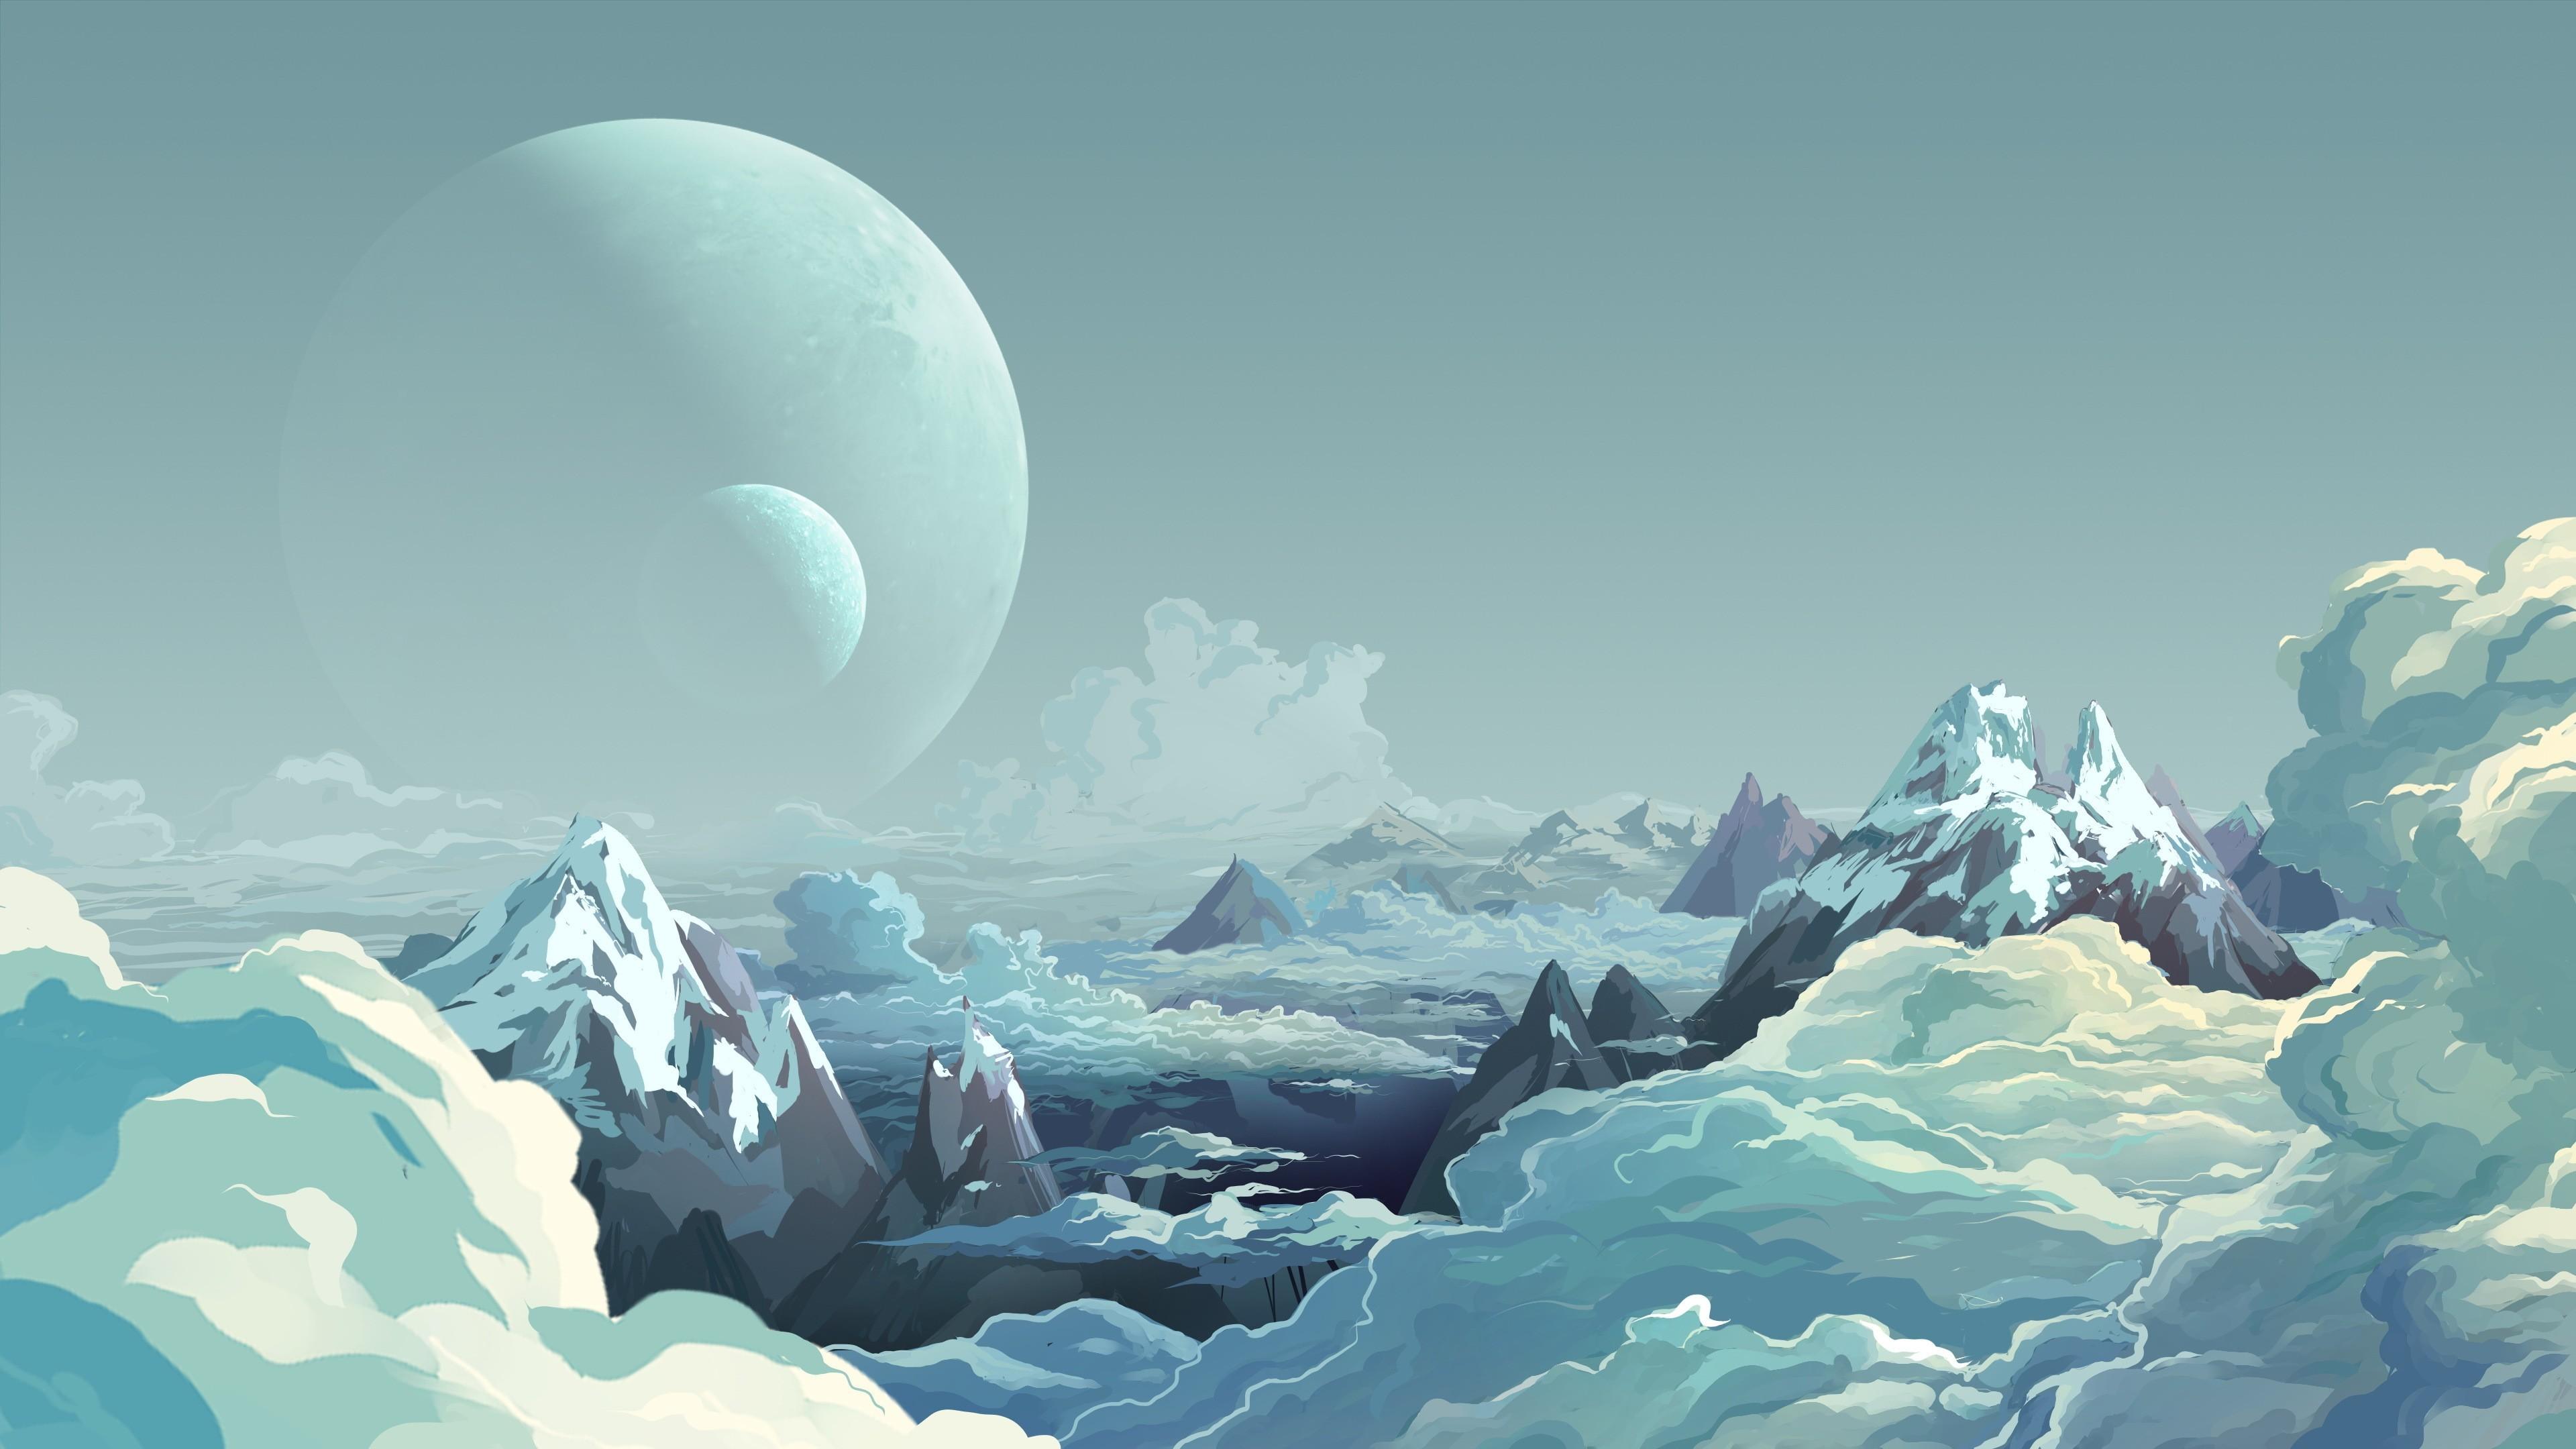 Fantasy Planets Landscape Page 2 Pics About Space